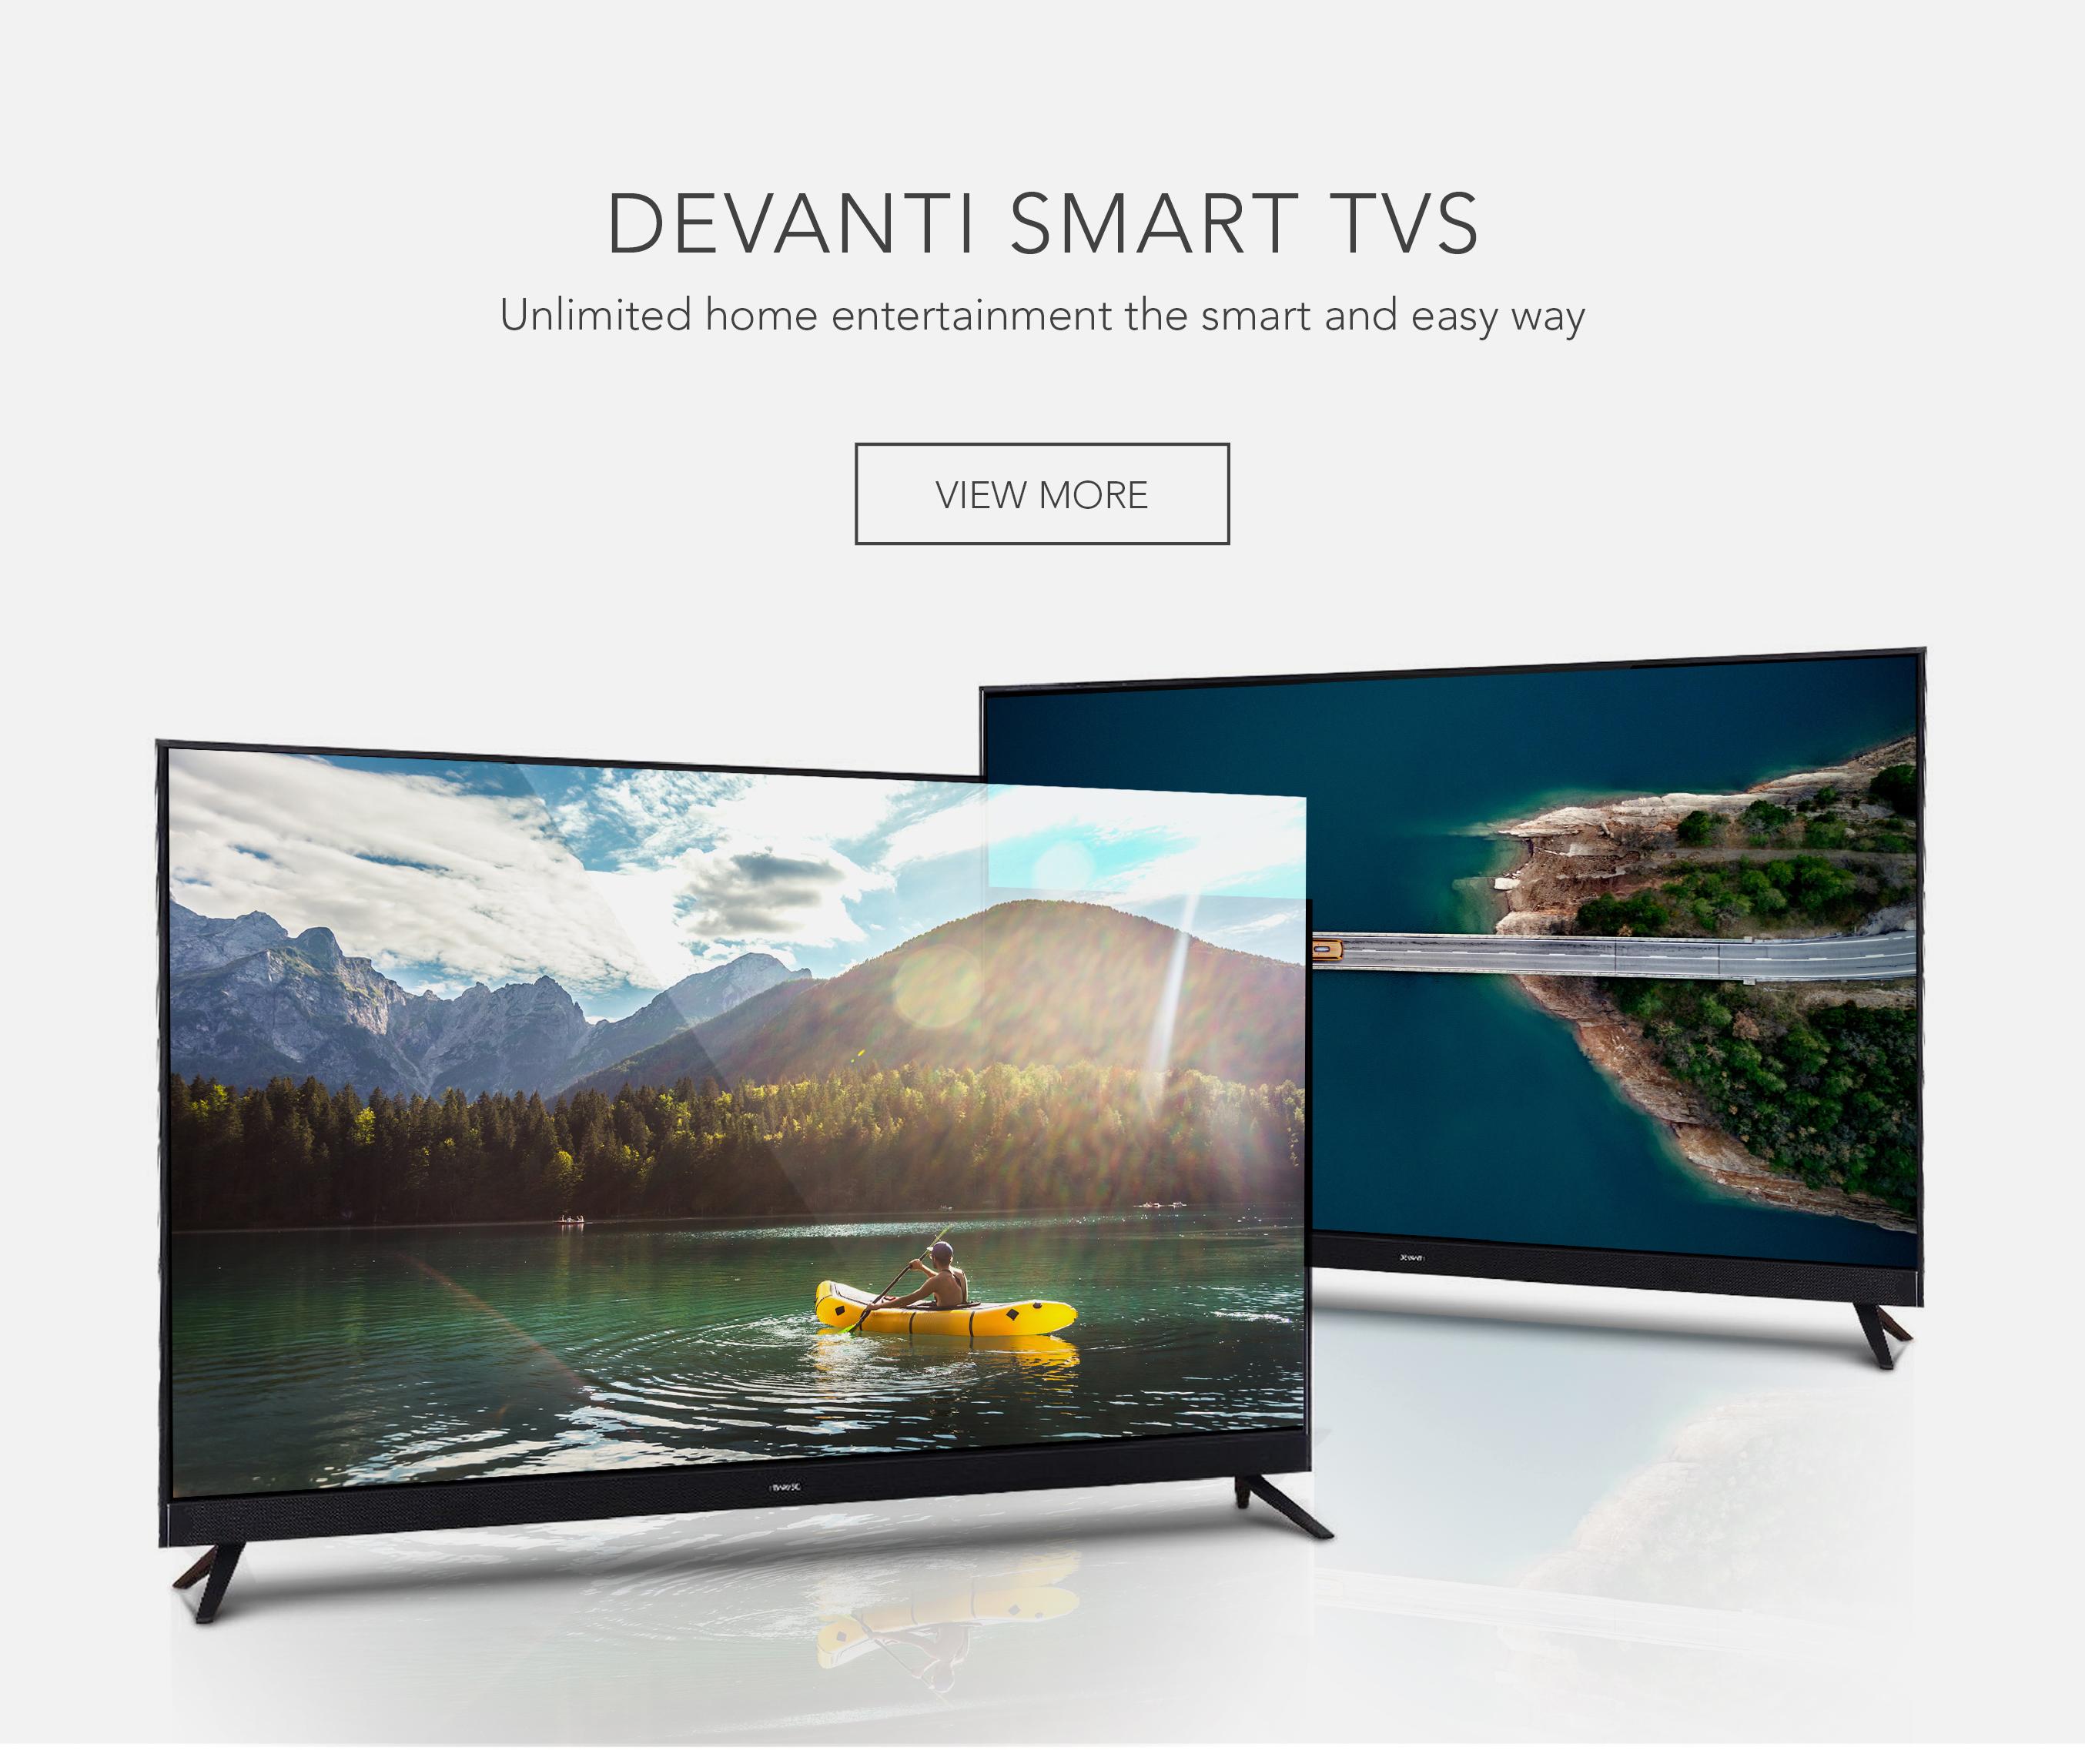 Devanti Smart TVs